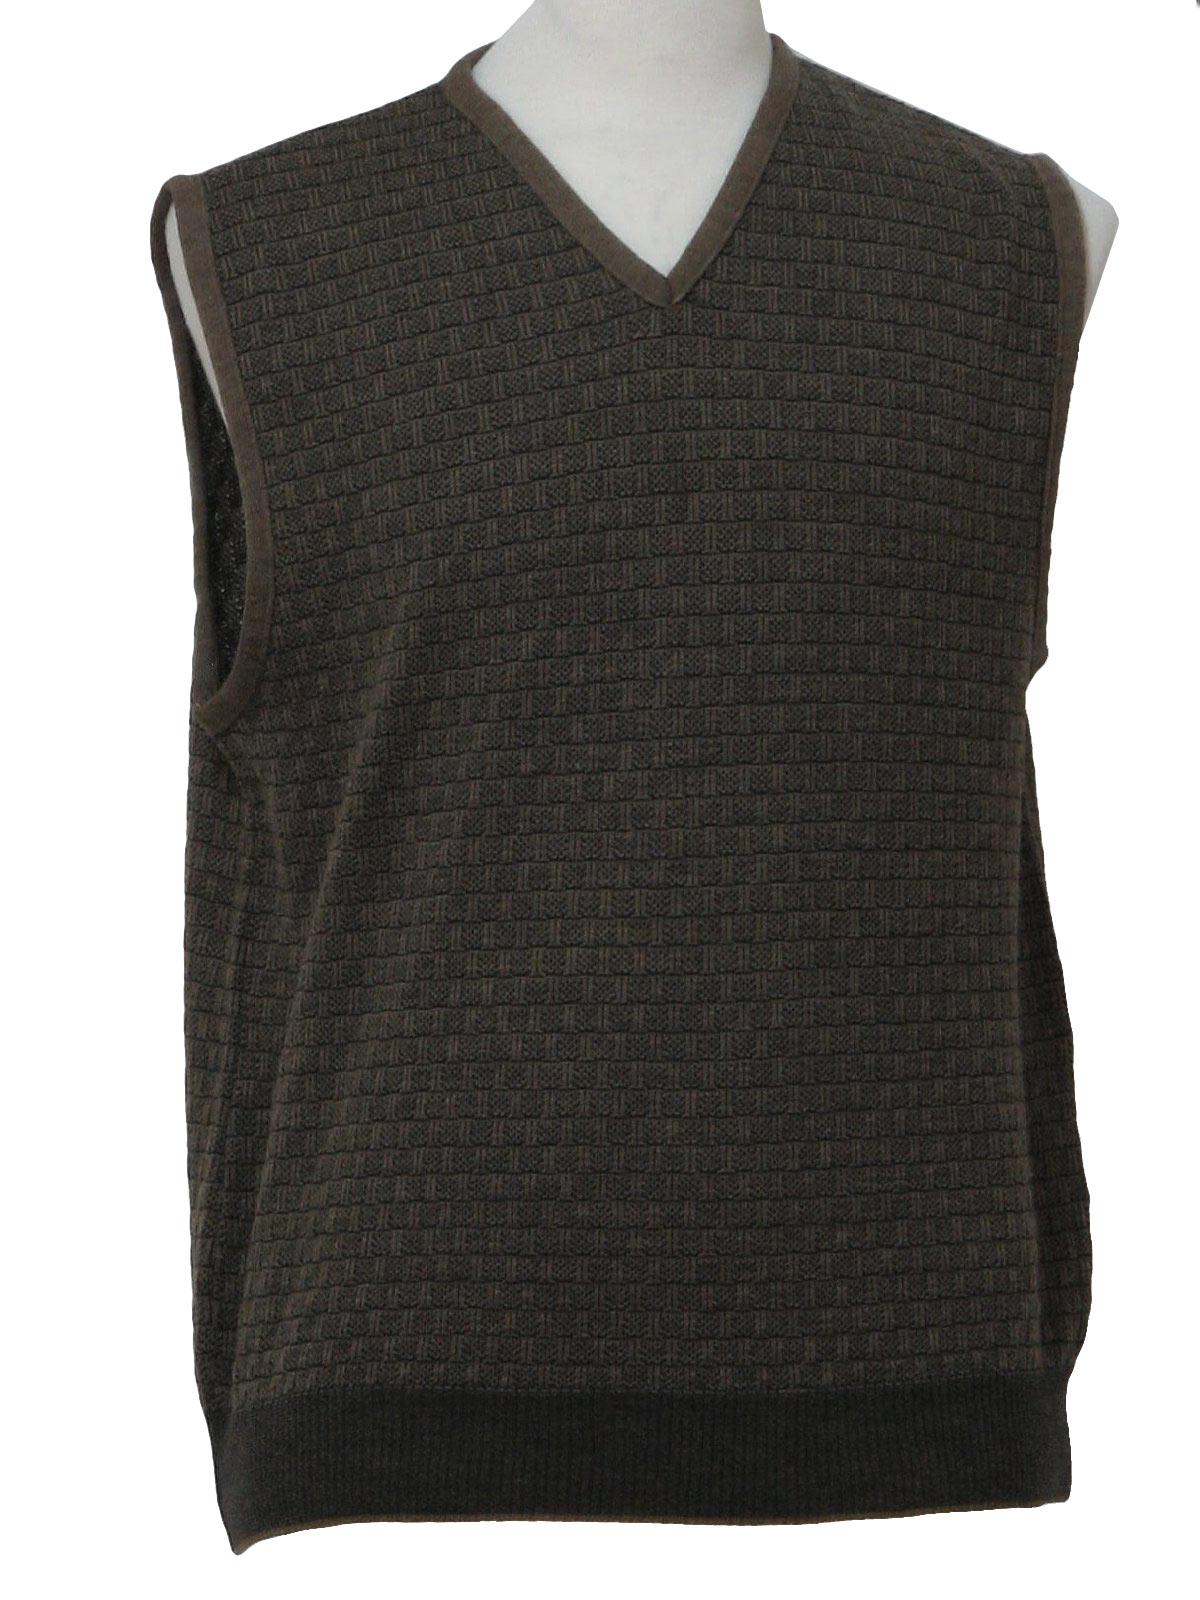 Basket Weave Vest Pattern : Segreto s vintage sweater mens taupe and